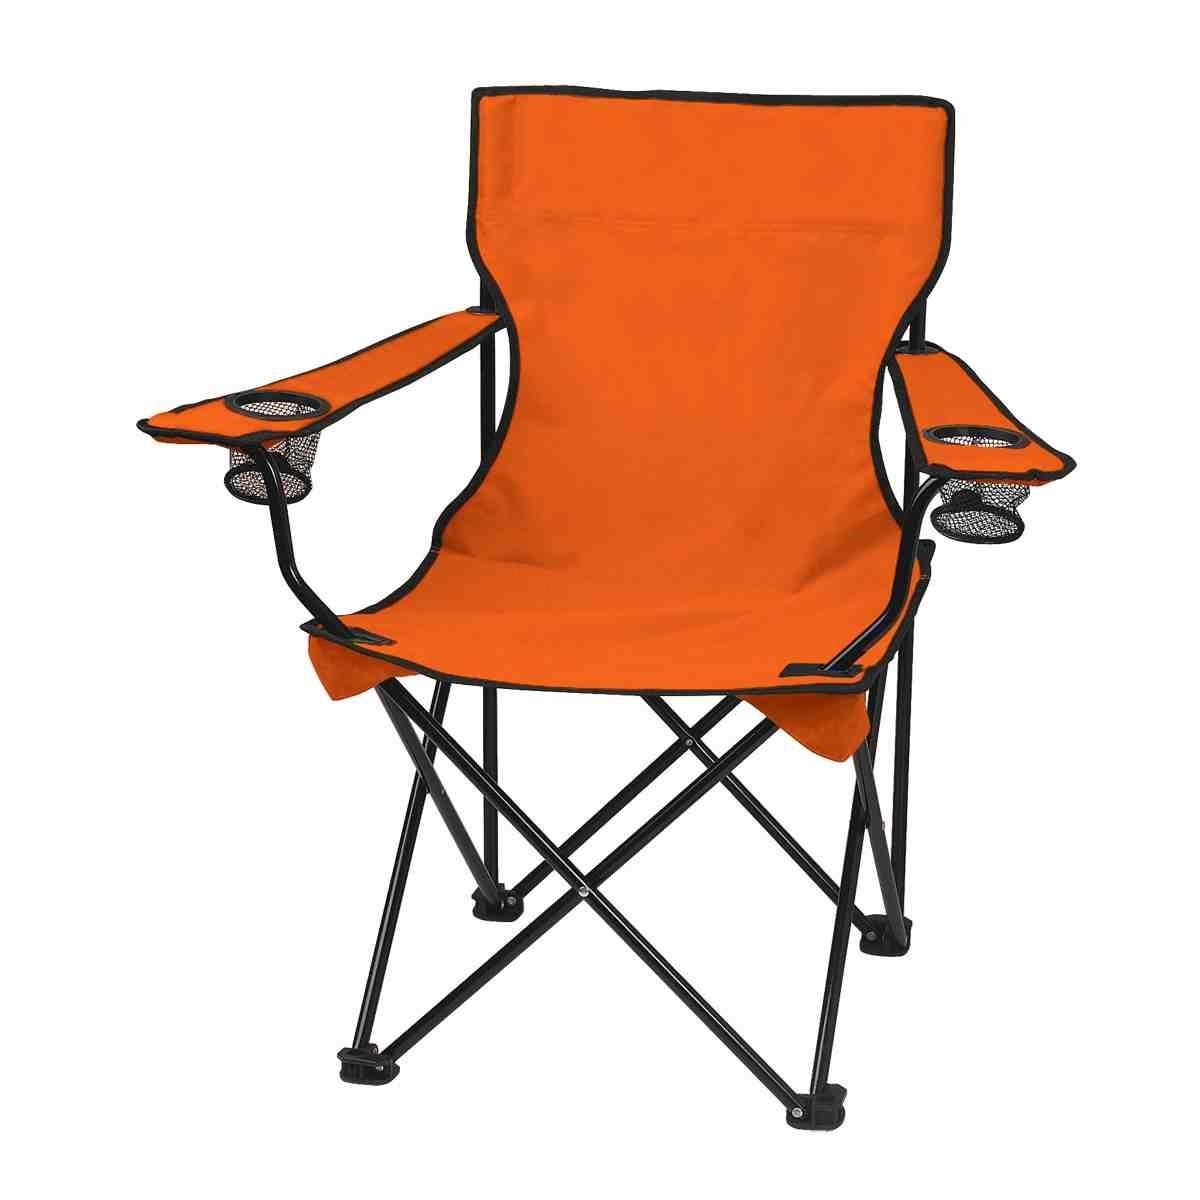 outdoor folding chairs on Outdoor Folding Chairs Outdoor Folding Chairs Folding Chair Camping Table